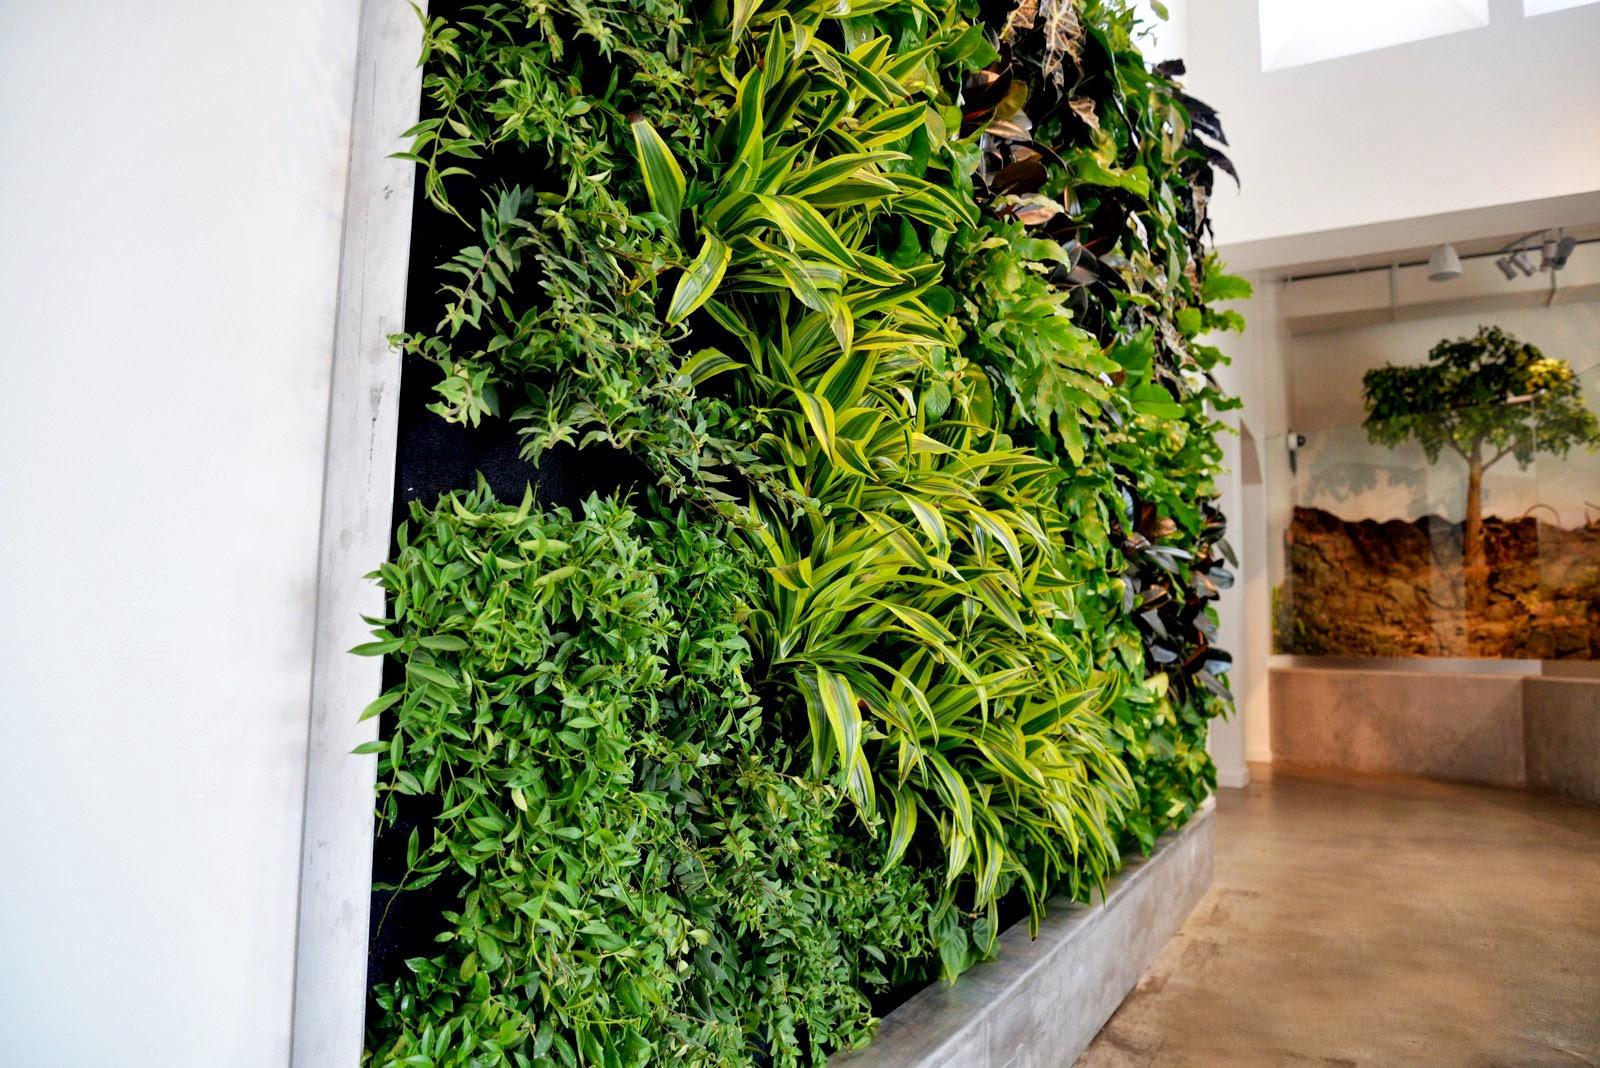 plants on walls vertical garden systems san francisco bay aquarium vertical garden. Black Bedroom Furniture Sets. Home Design Ideas